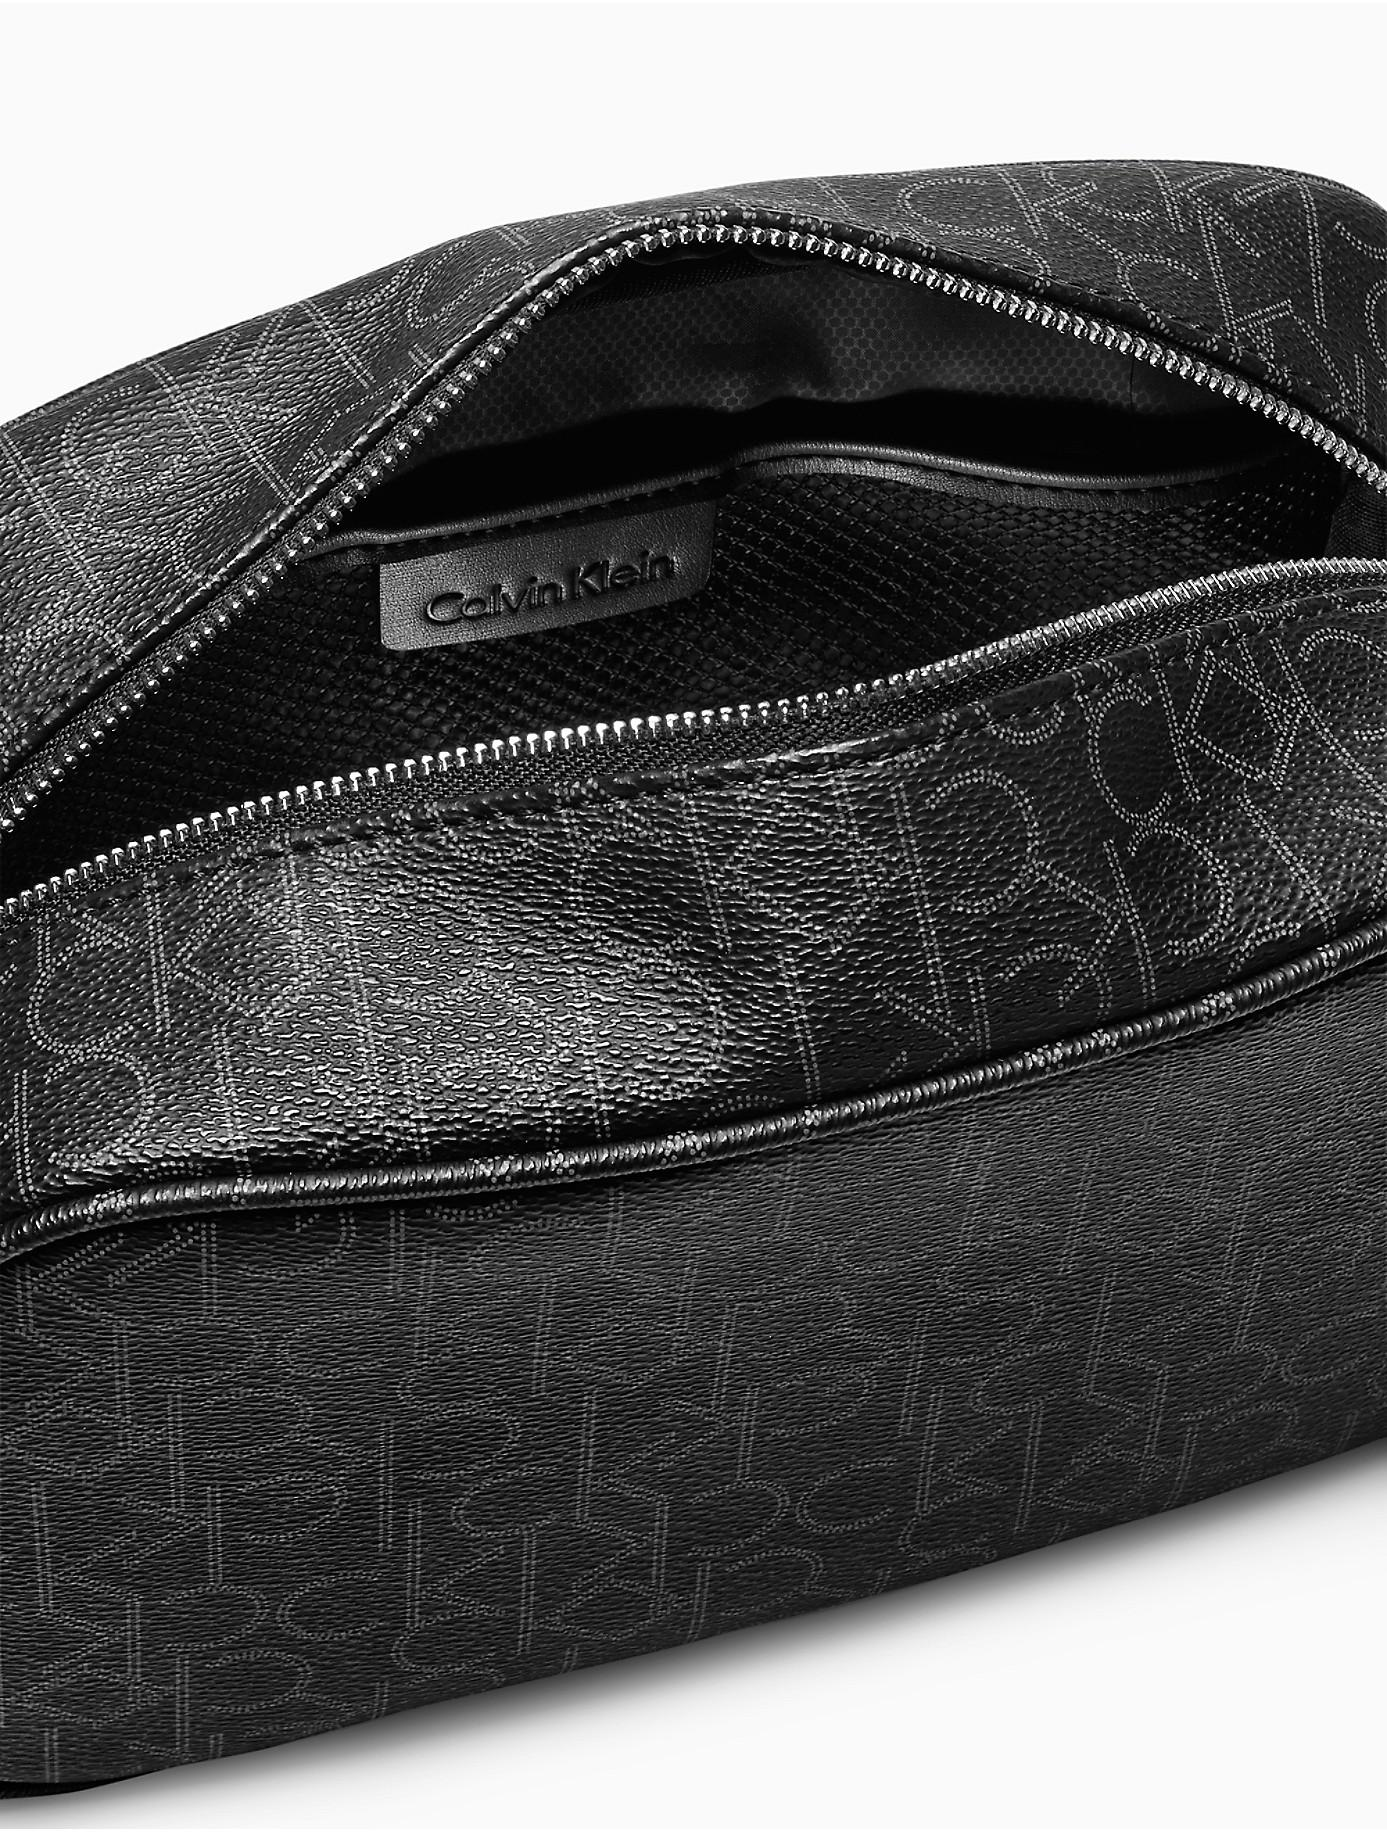 56233188c825 Lyst - Calvin Klein Monogram Dopp Kit in Black - Save ...